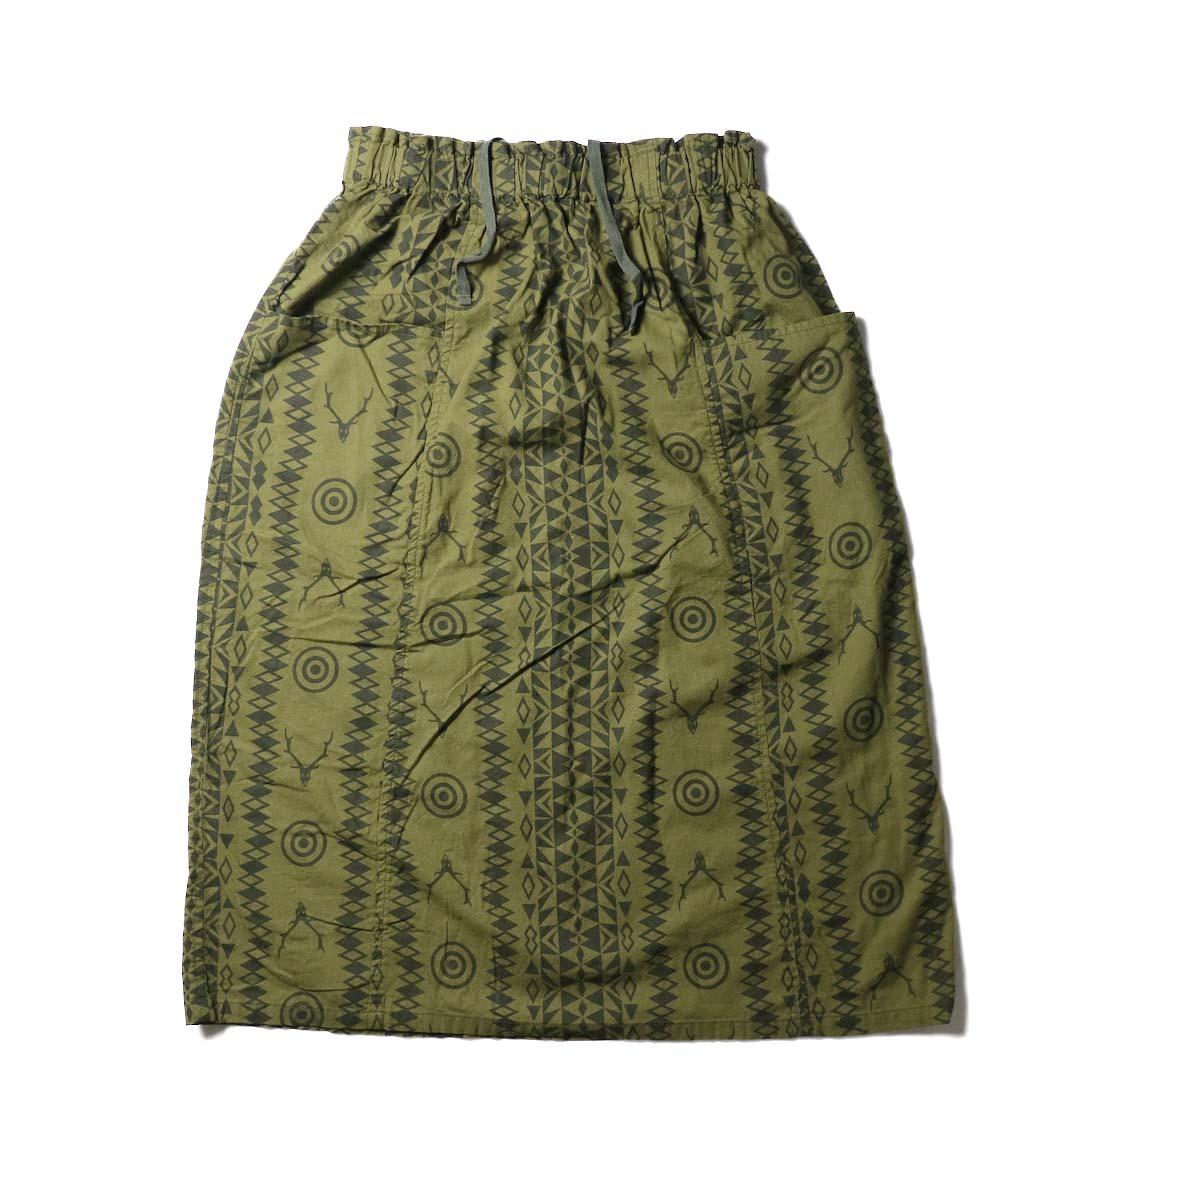 SOUTH2 WEST8 / Army String Skirt -Flannel Pt. (Skull & Target)